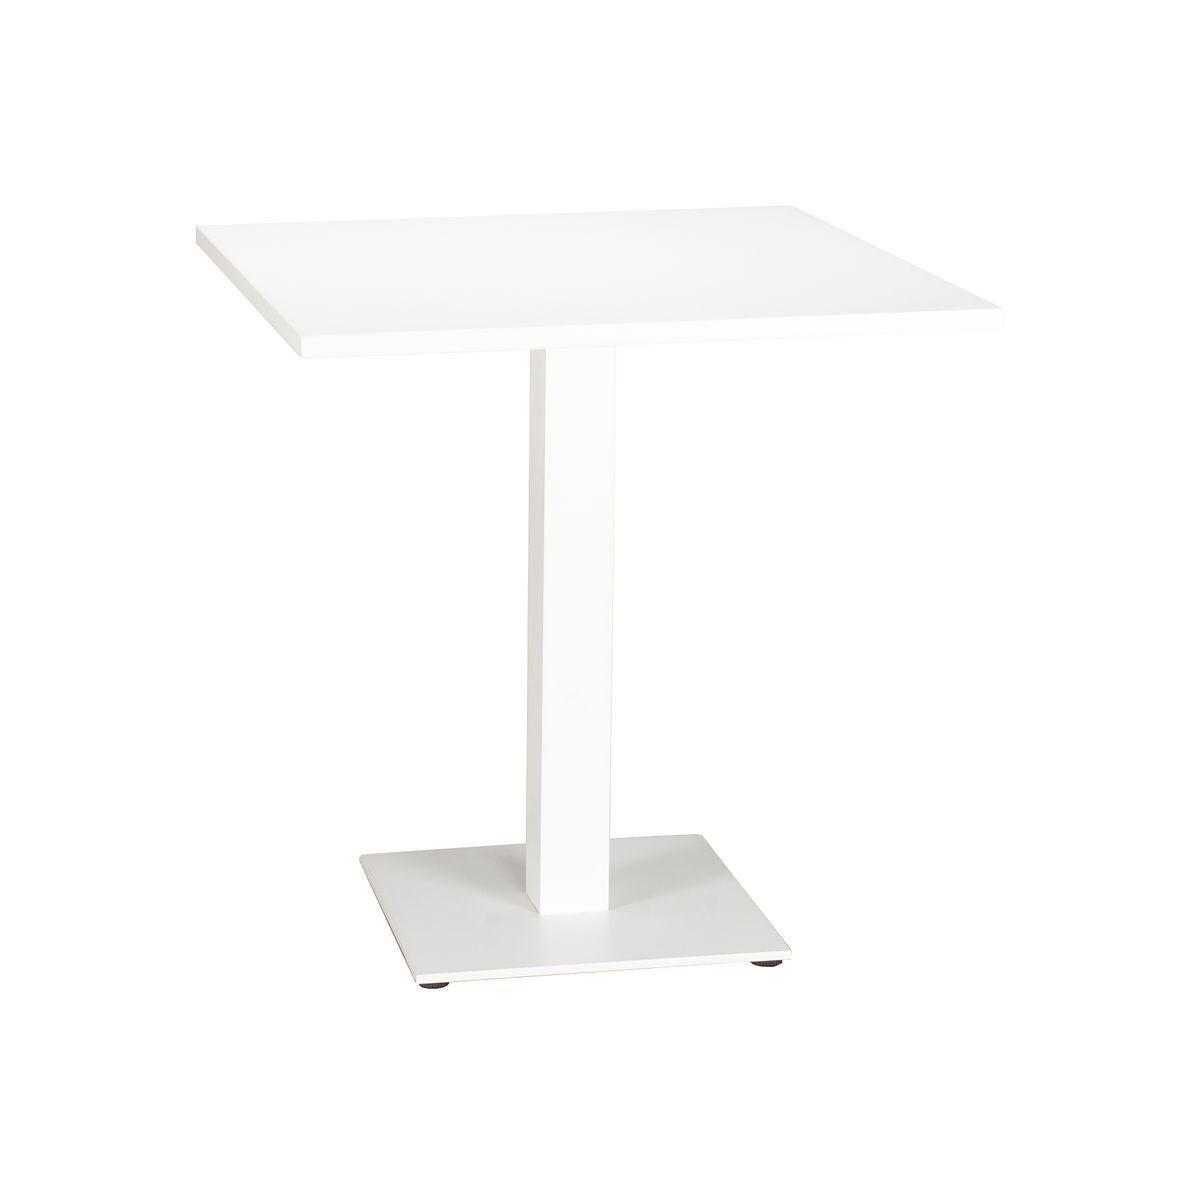 Table extérieure en aluminium blanc